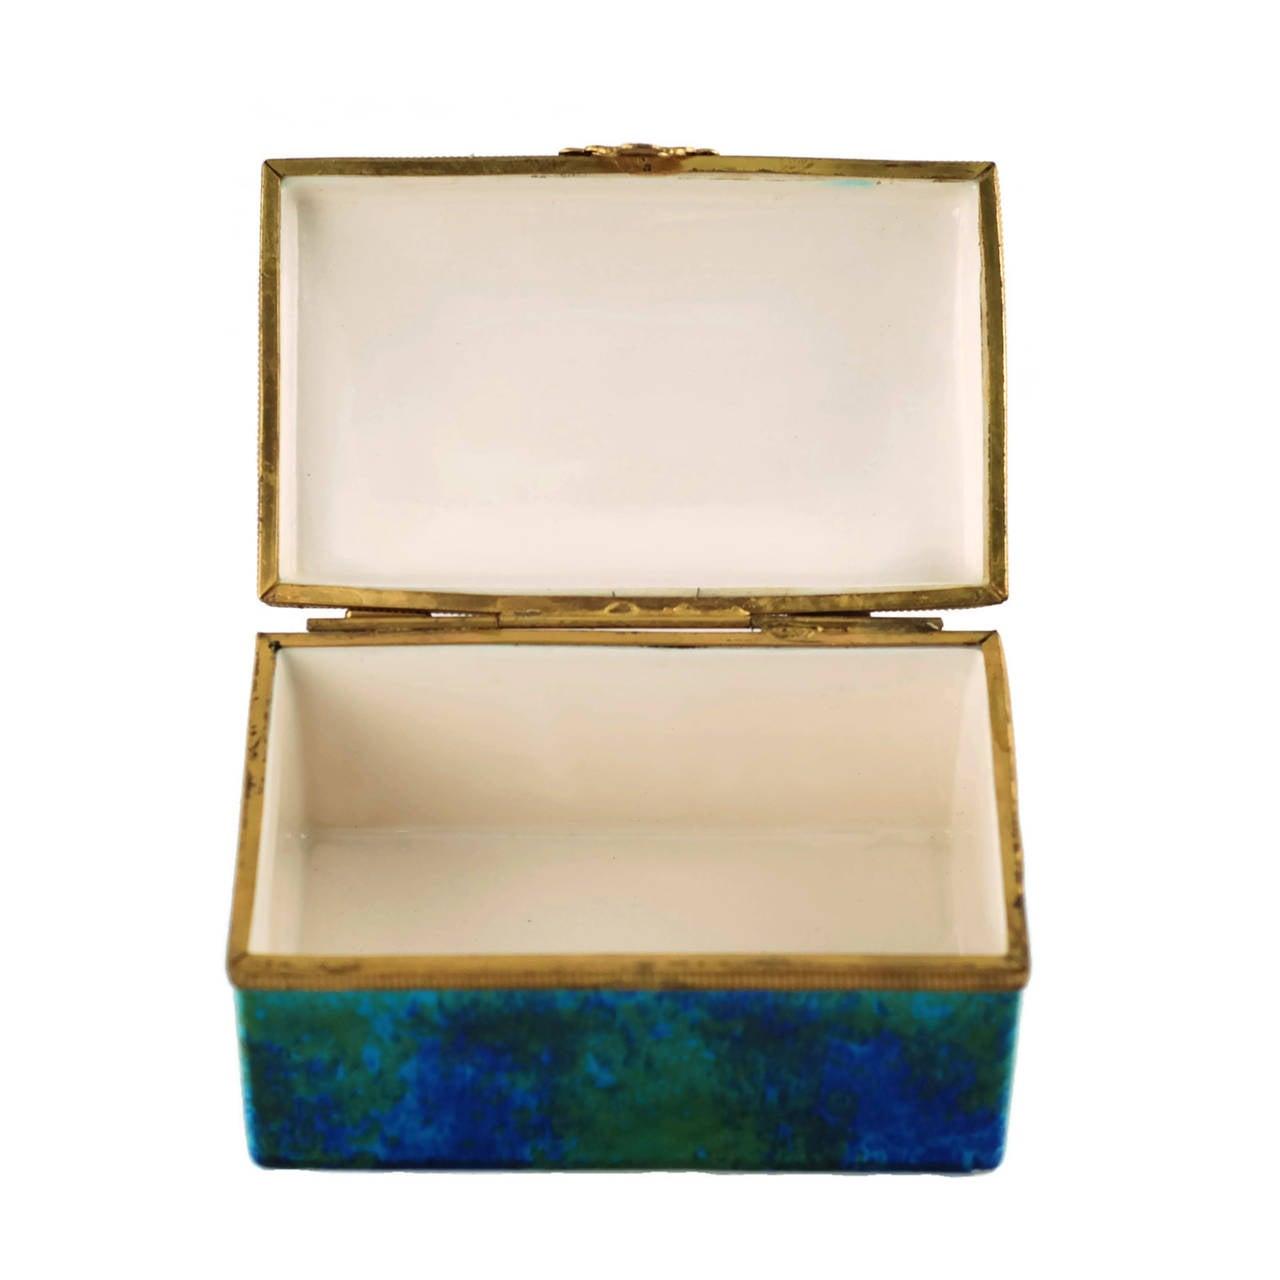 Paul Milet Sèvres Porcelain Hinged Dresser Box with Ormolu Mounts For Sale 2